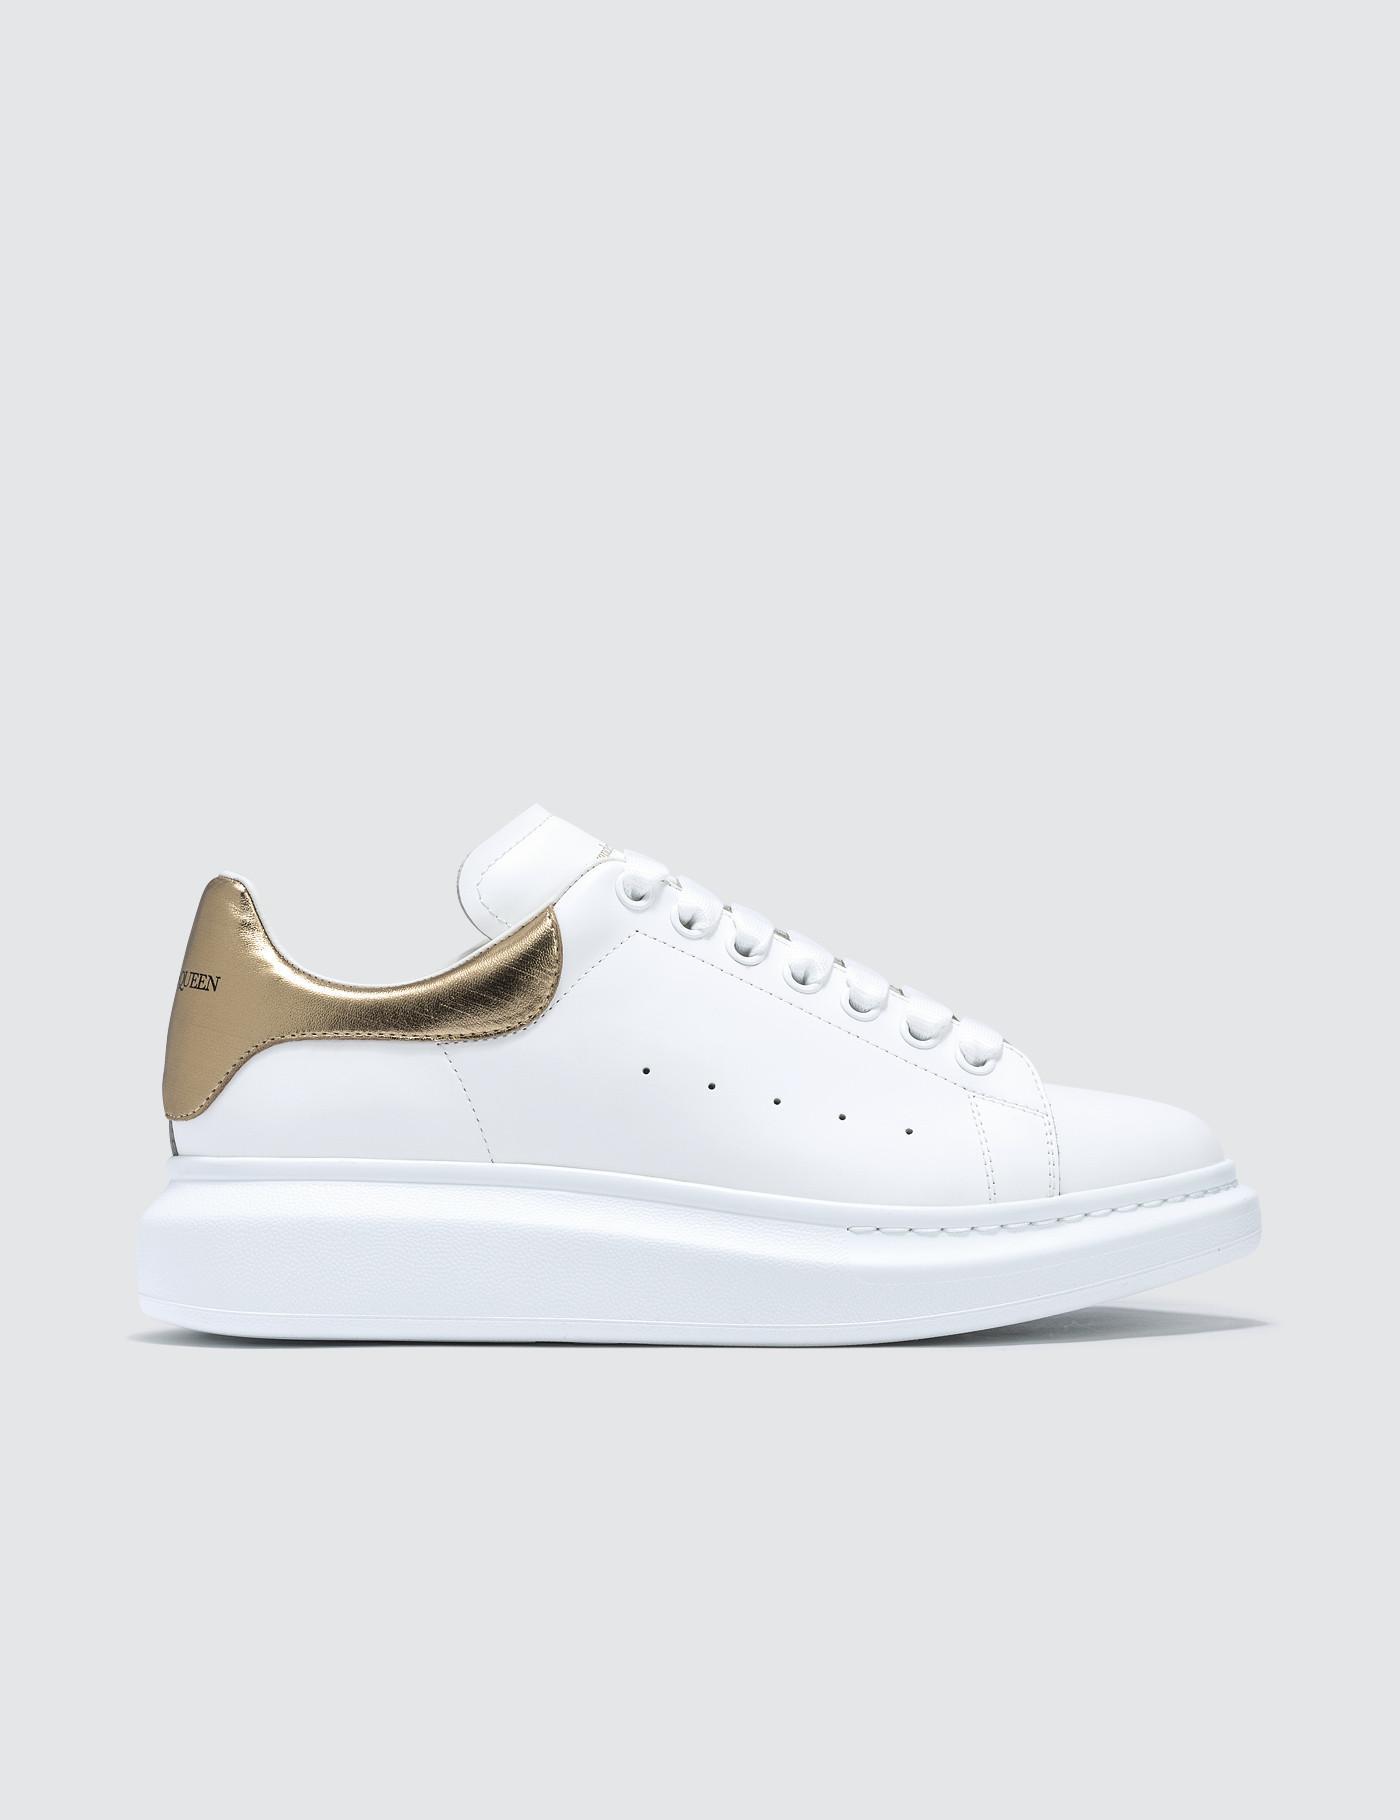 15a6abf8546e Lyst - Alexander McQueen Oversized Sneaker in White for Men